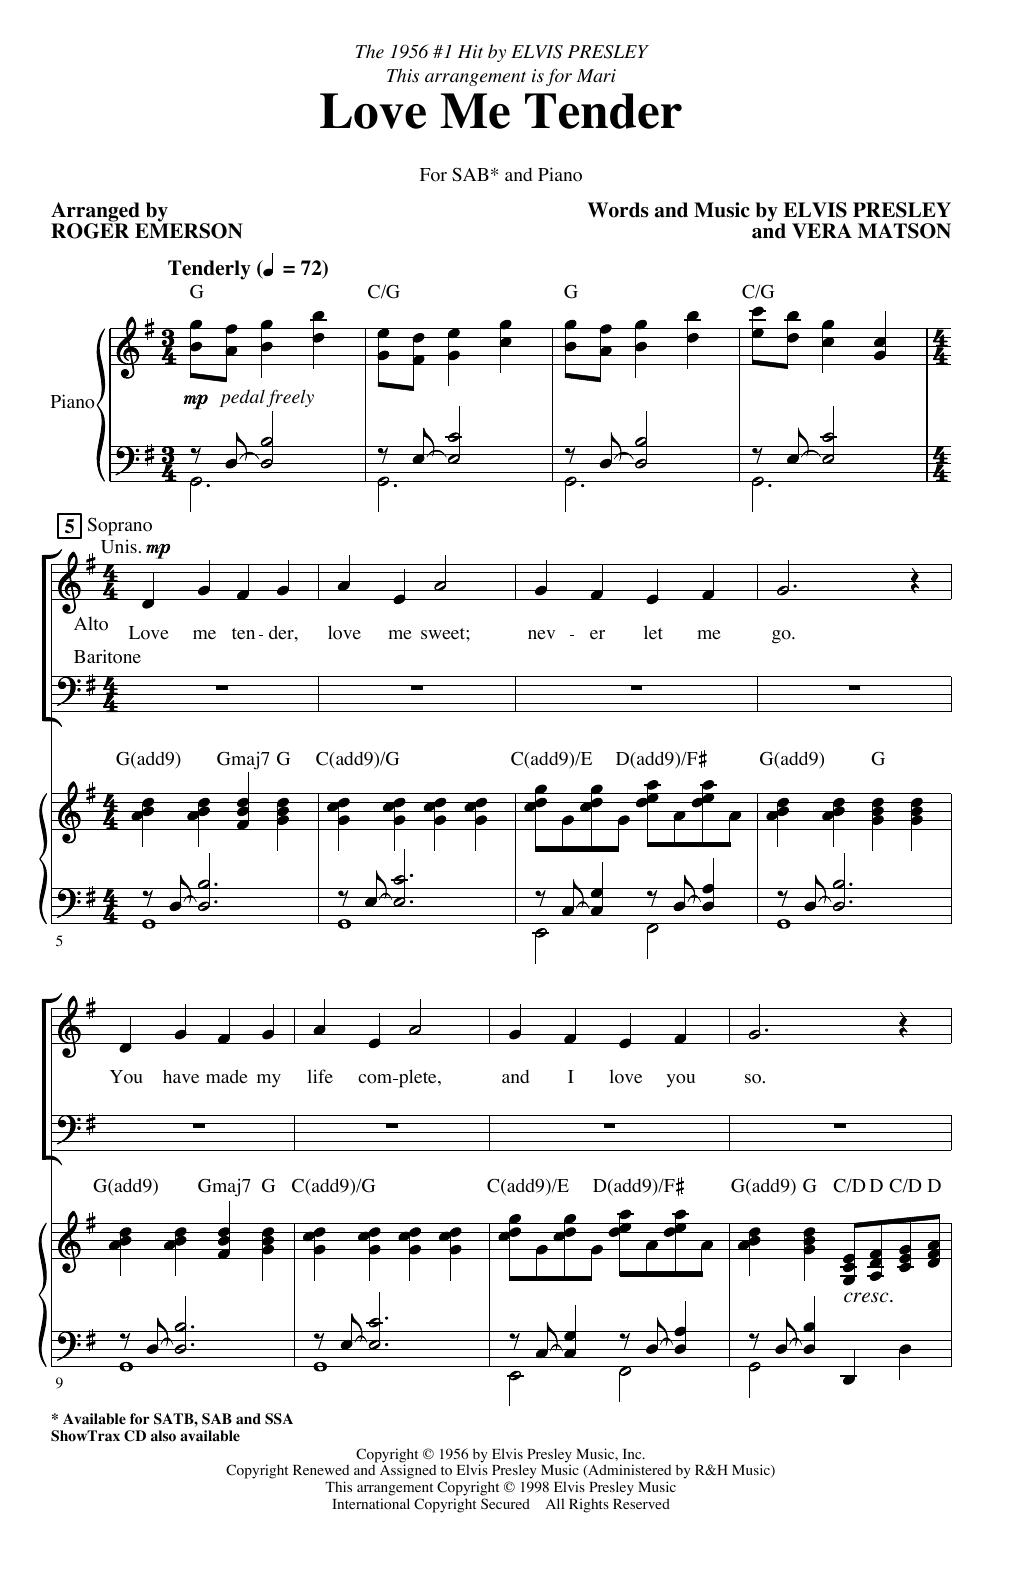 Love Me Tender (arr. Roger Emerson) (SAB Choir)